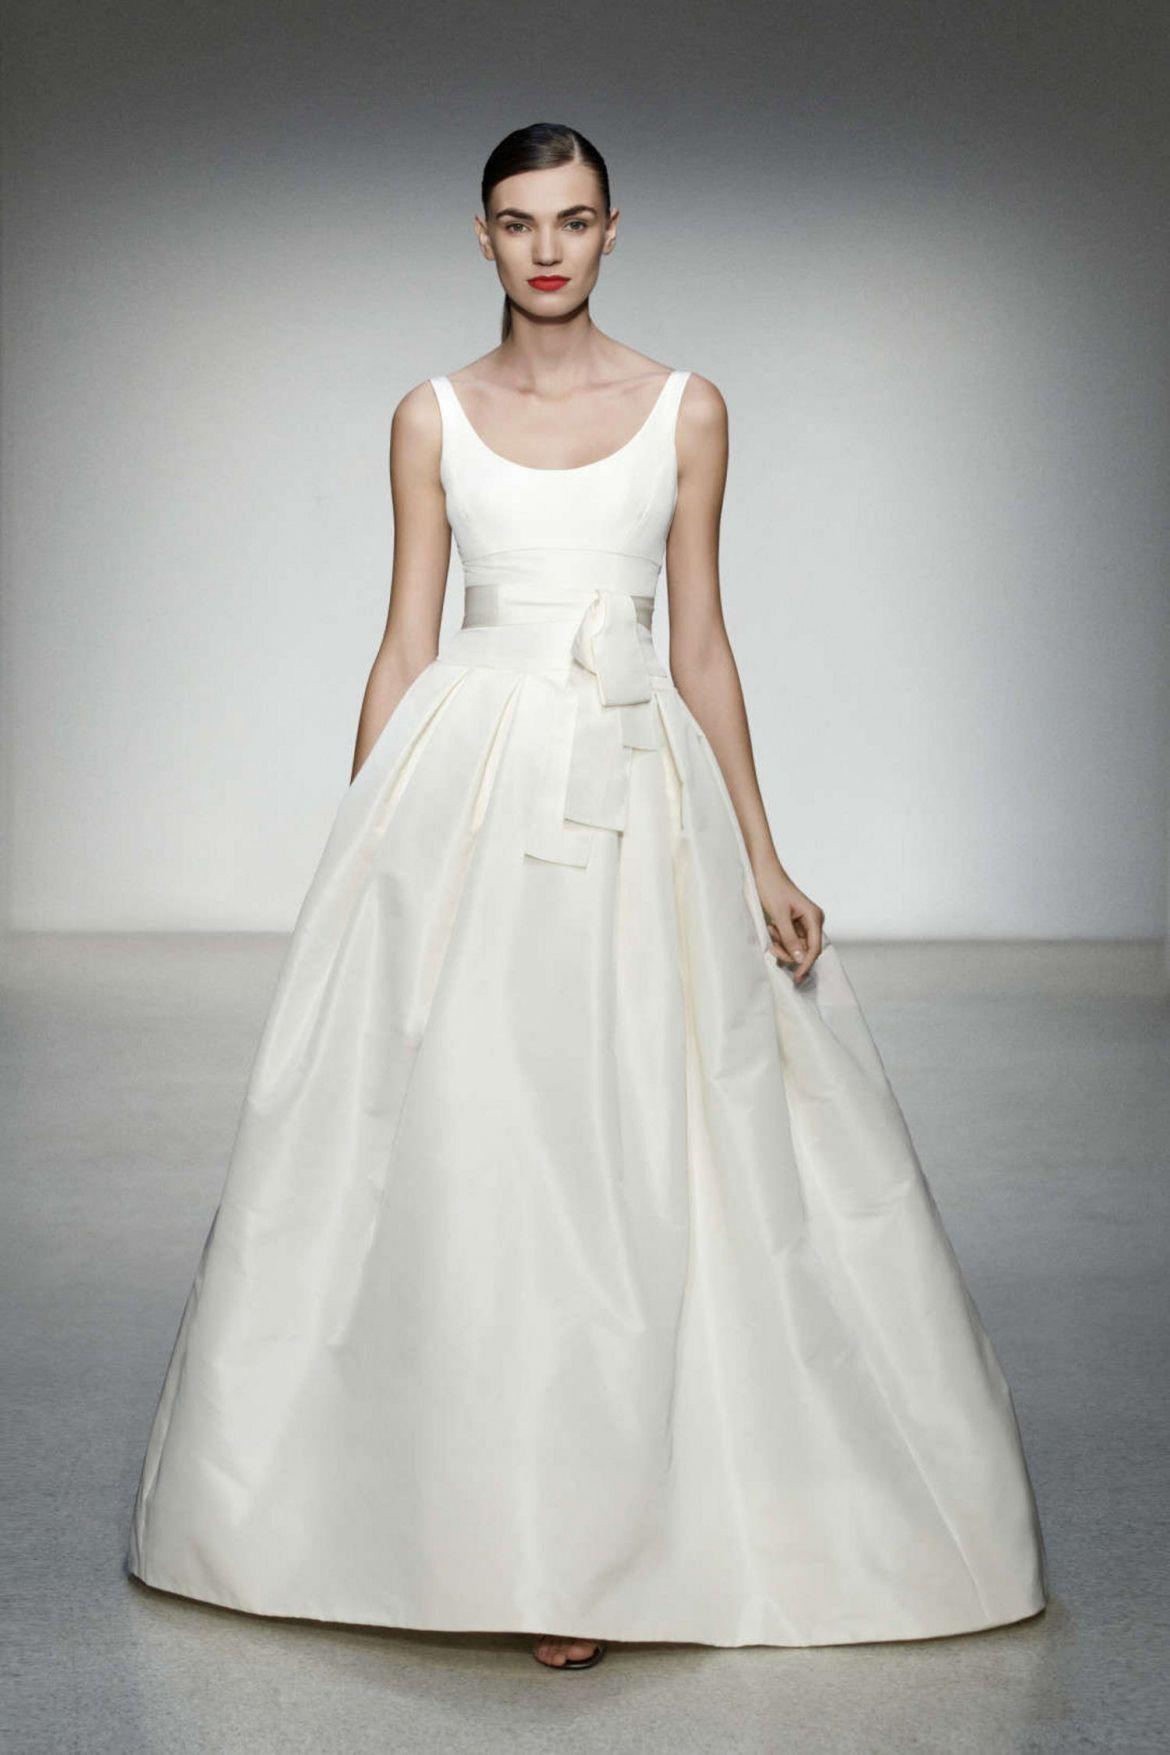 Country dresses for weddings   Angelina Wedding Dress  Country Dresses for Weddings Check more